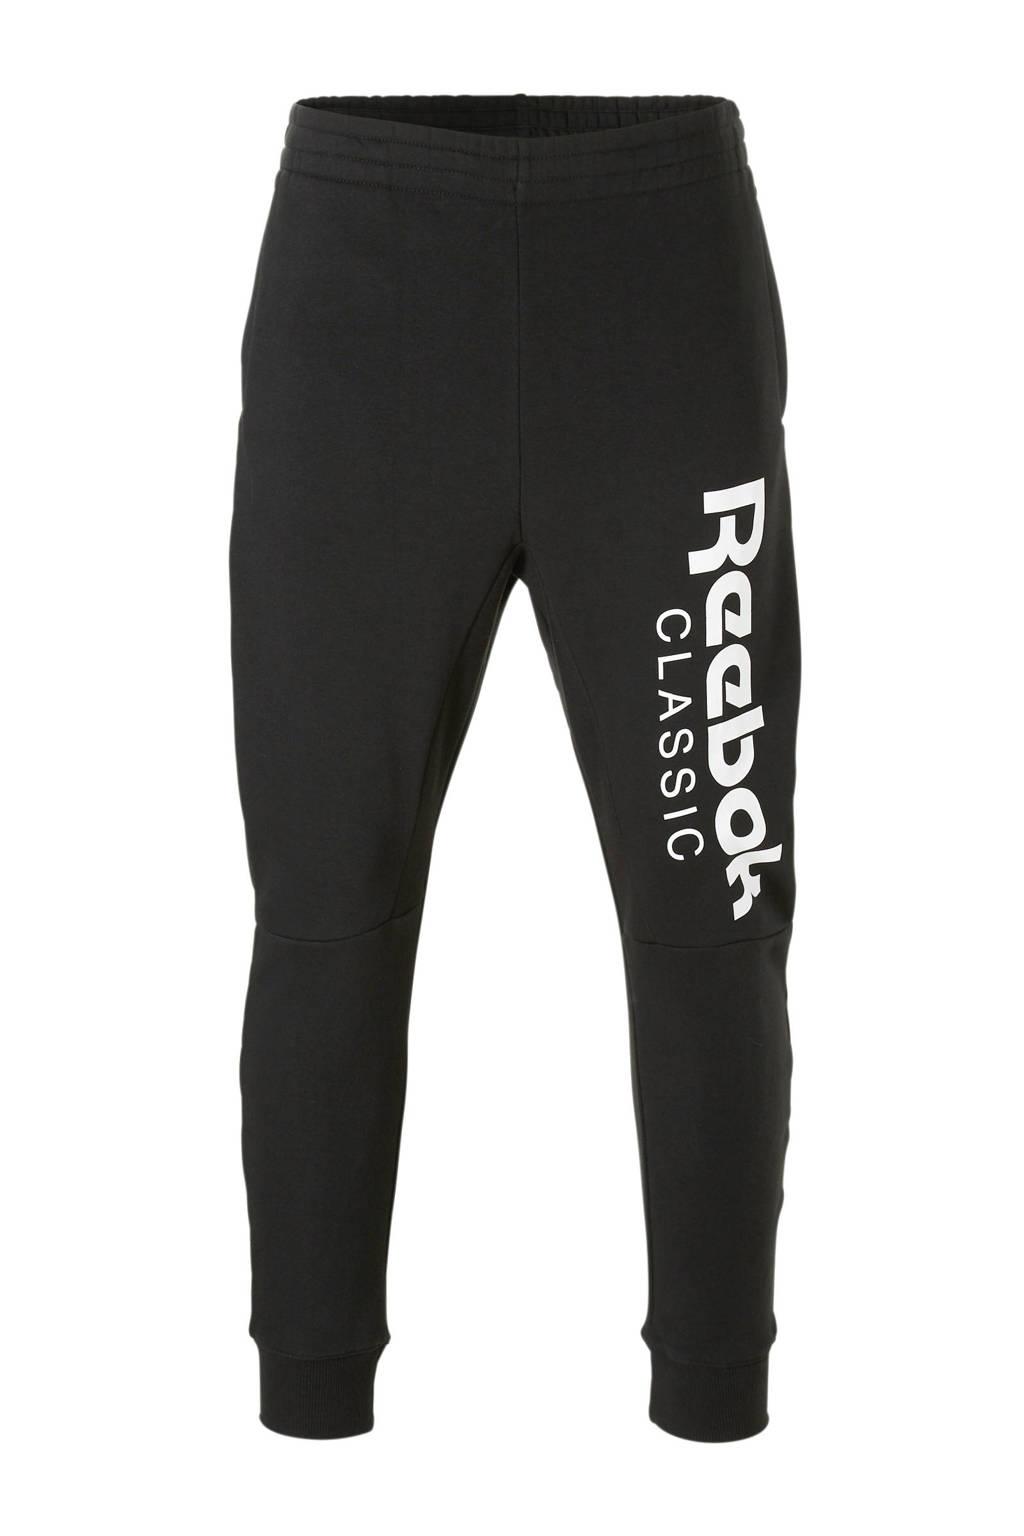 Reebok Classics Classics joggingbroek zwart, Zwart